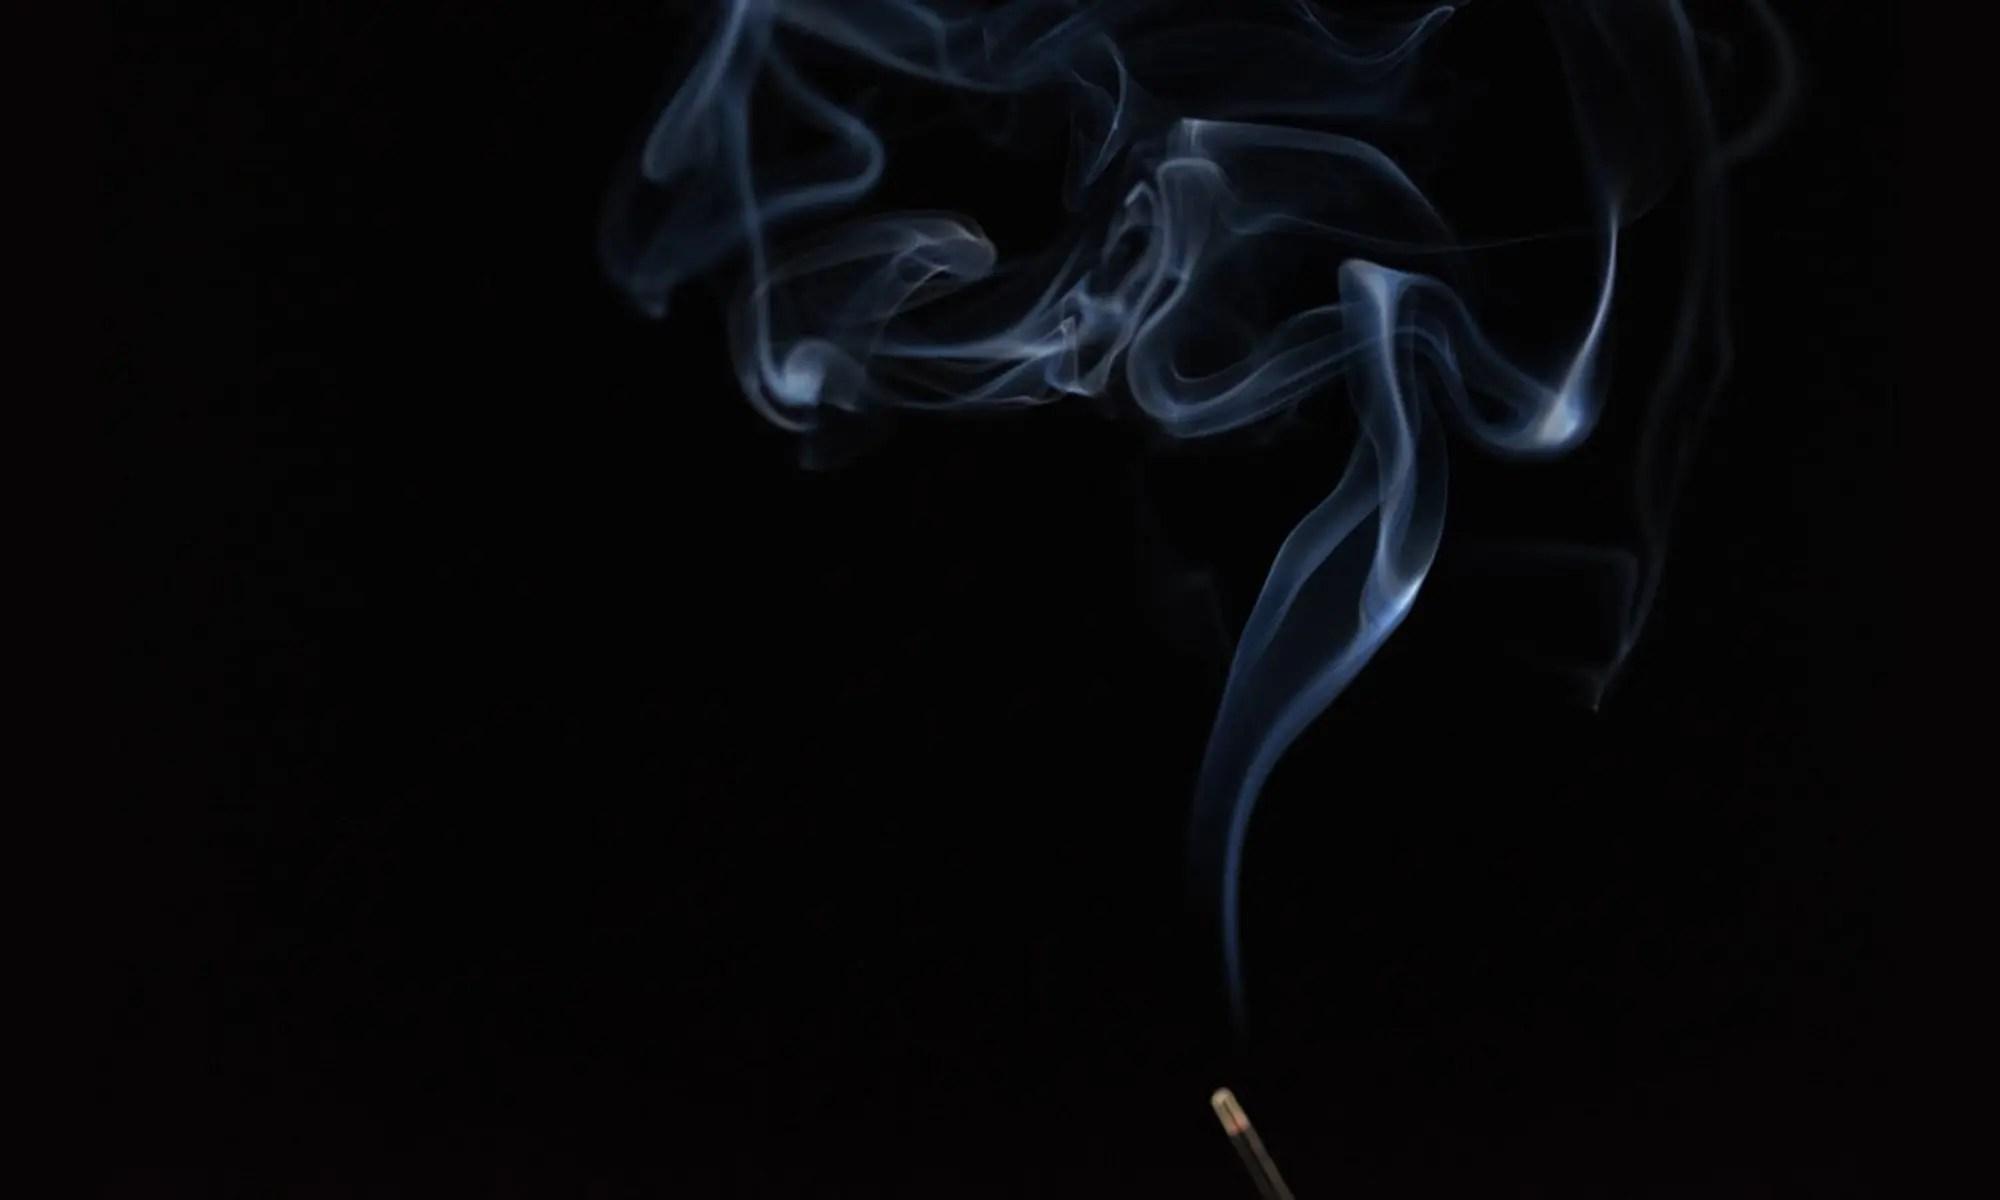 image of cigarette smoke